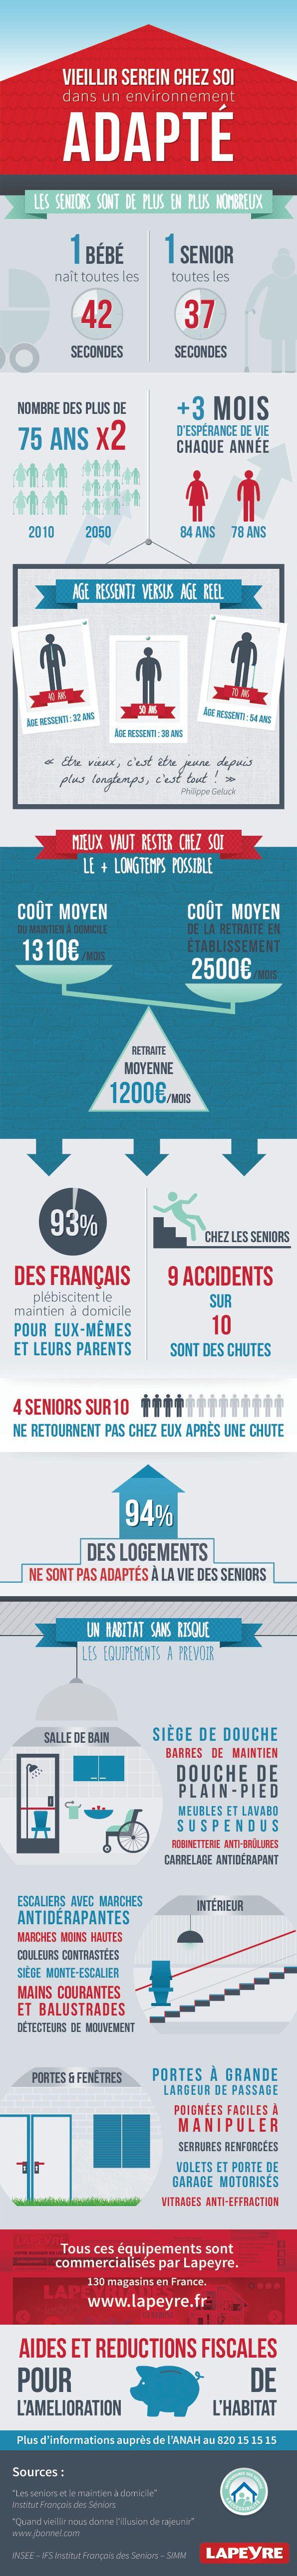 infographie lapeyre